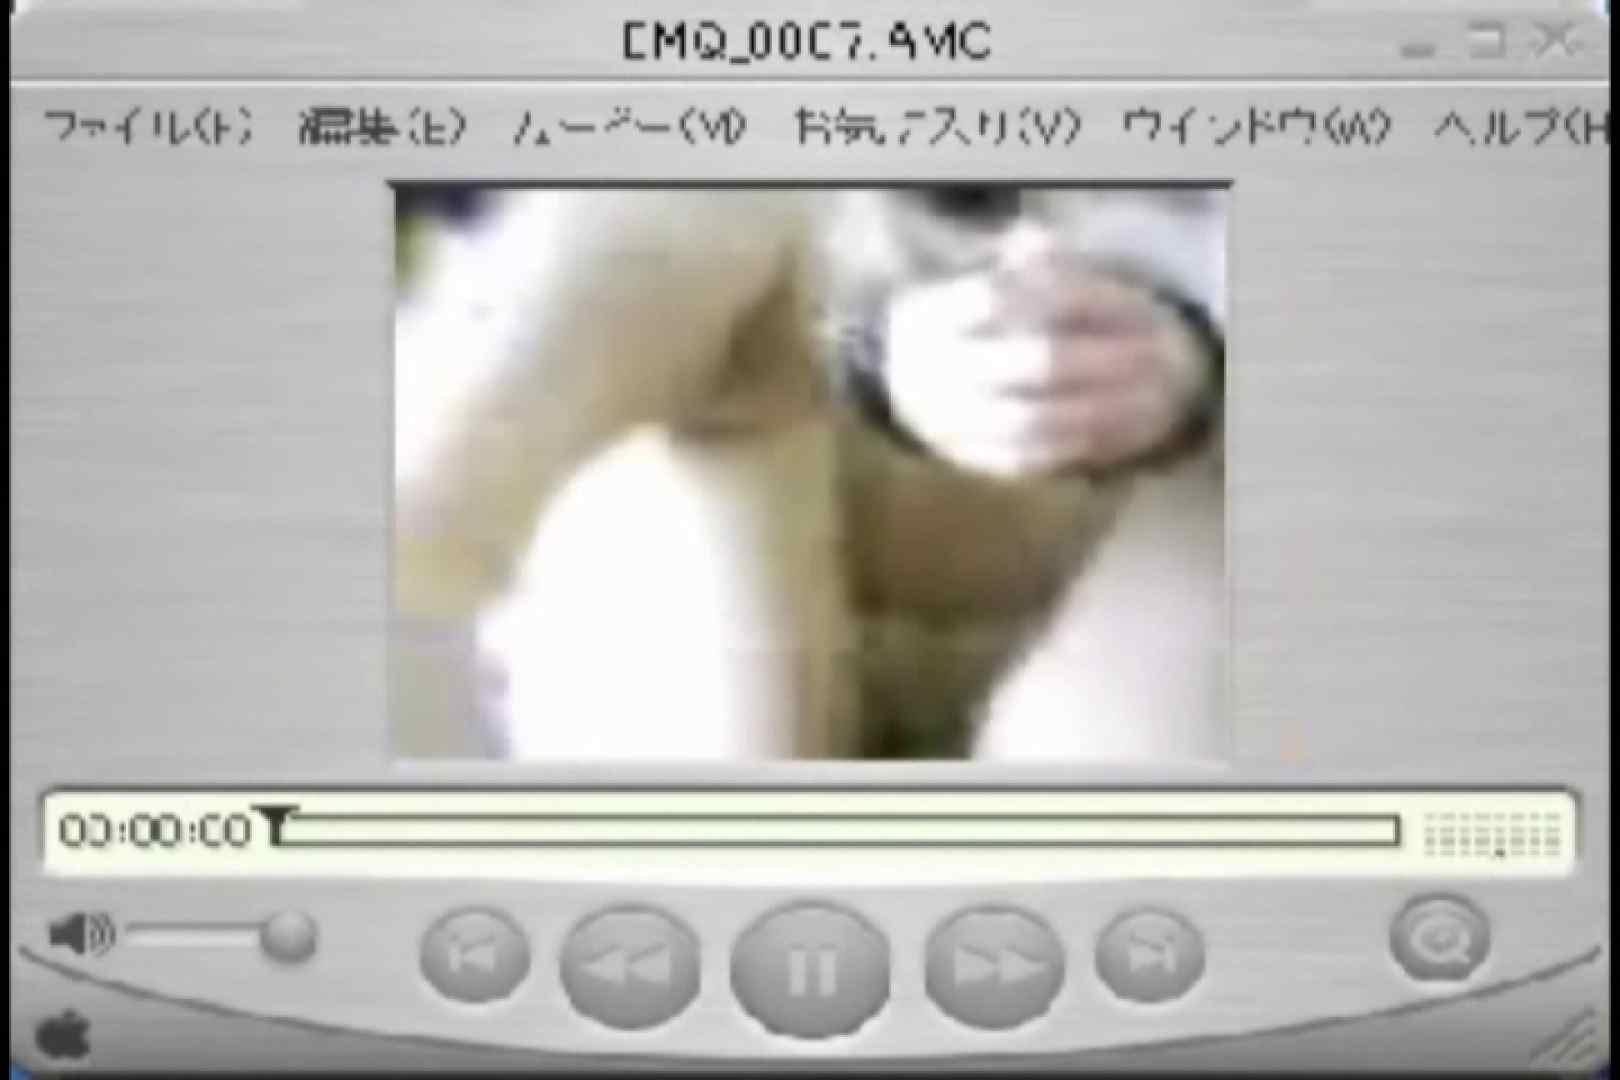 Shigeruのアルバム 流出作品  98pic 84